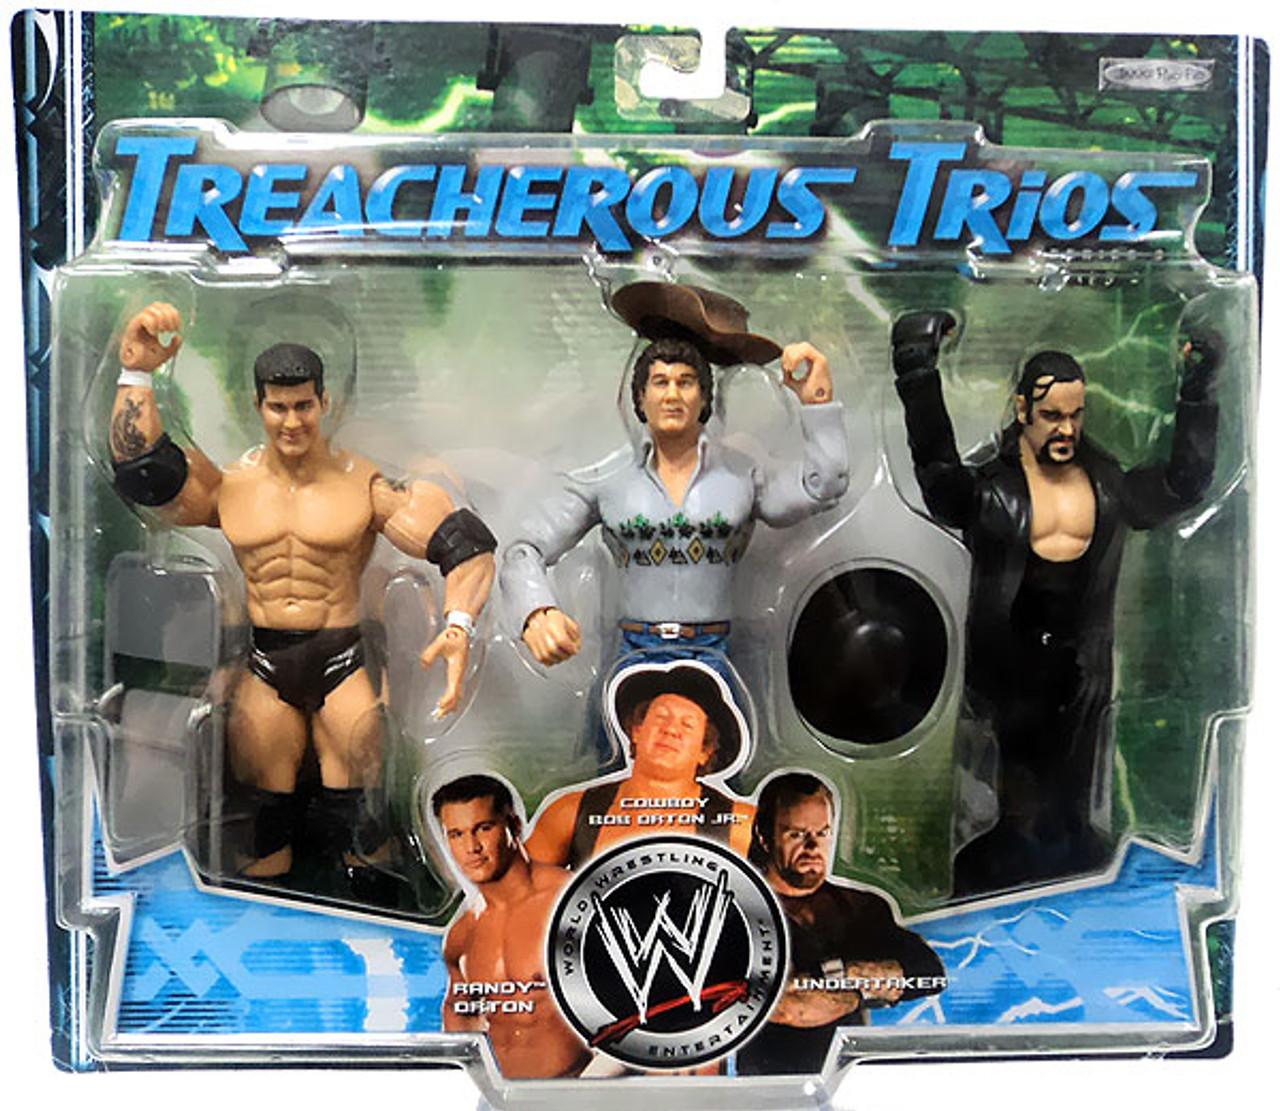 WWE Wrestling Treacherous Trios Series 3 Randy Orton, Cowboy Bob Orton & Undertaker Exclusive Action Figure 3-Pack